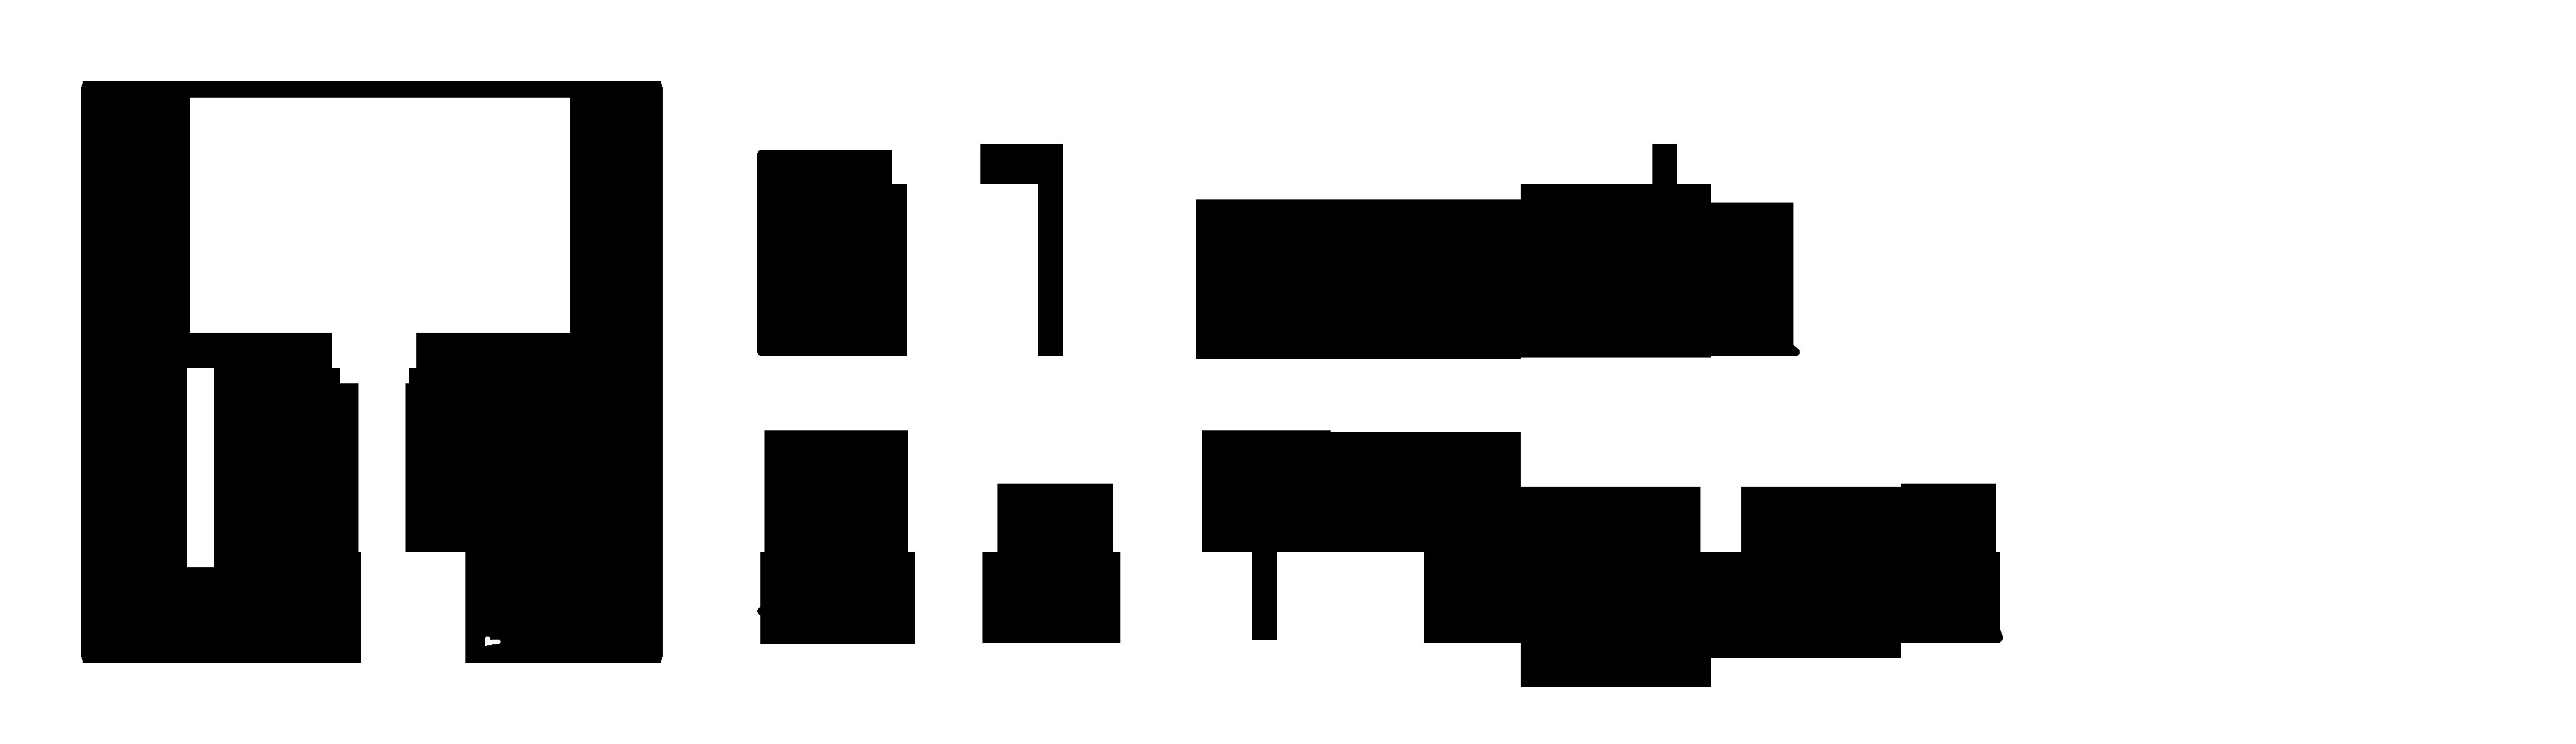 Black Safaya